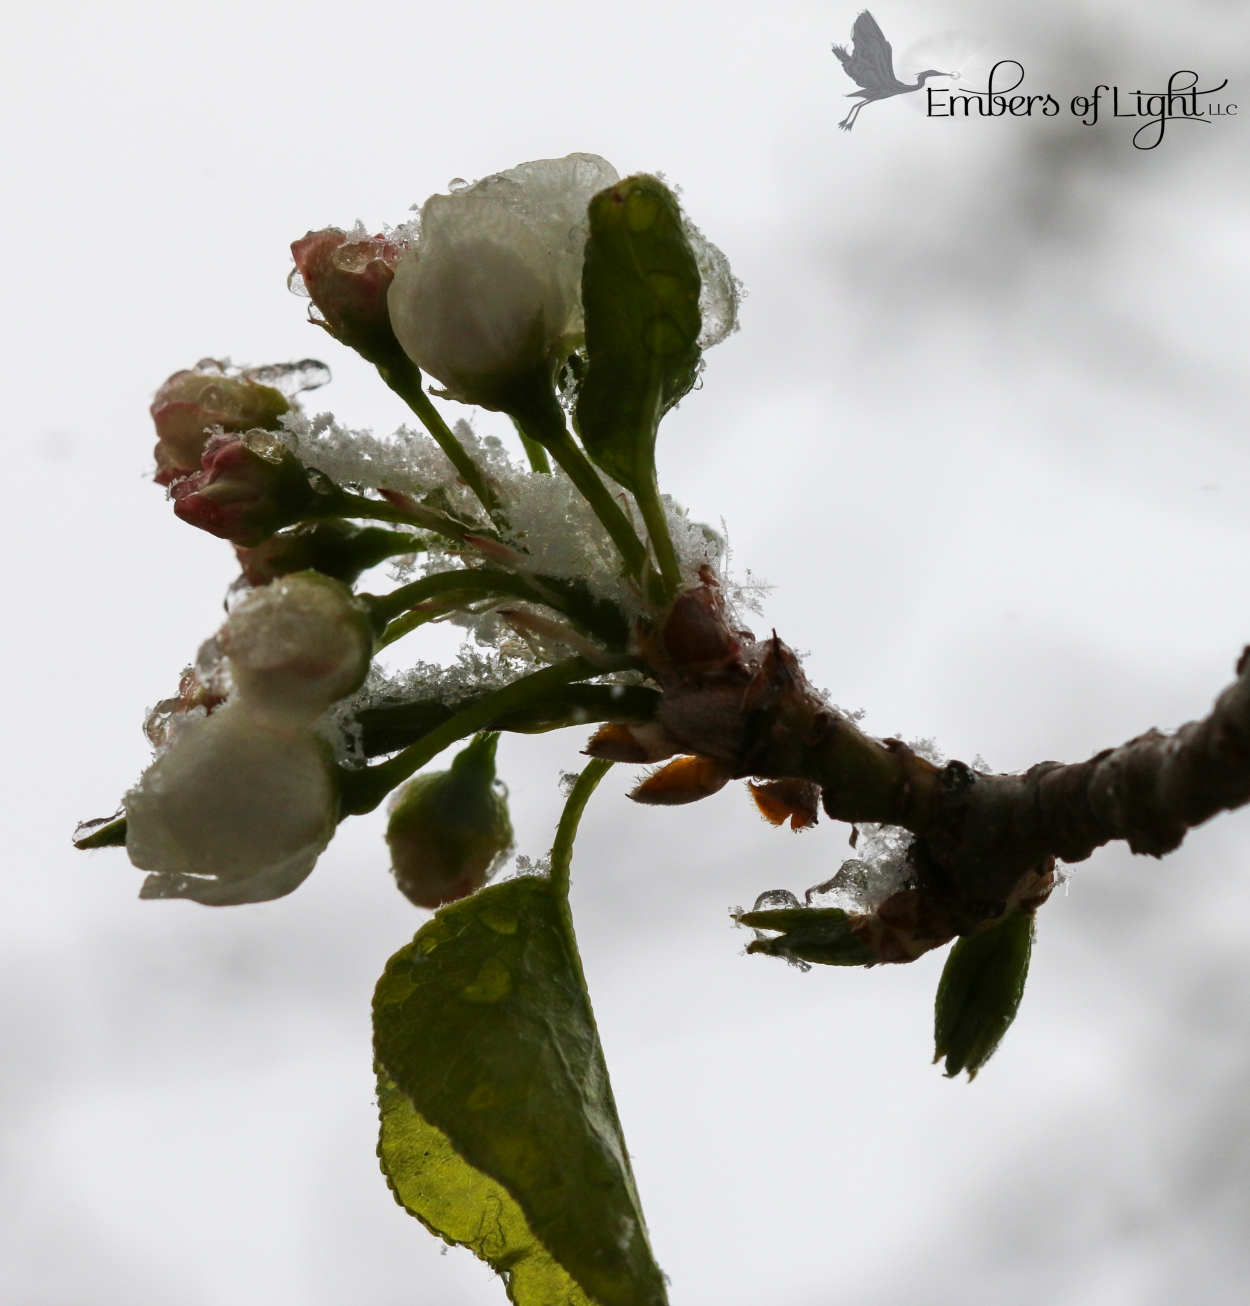 snowy blossom